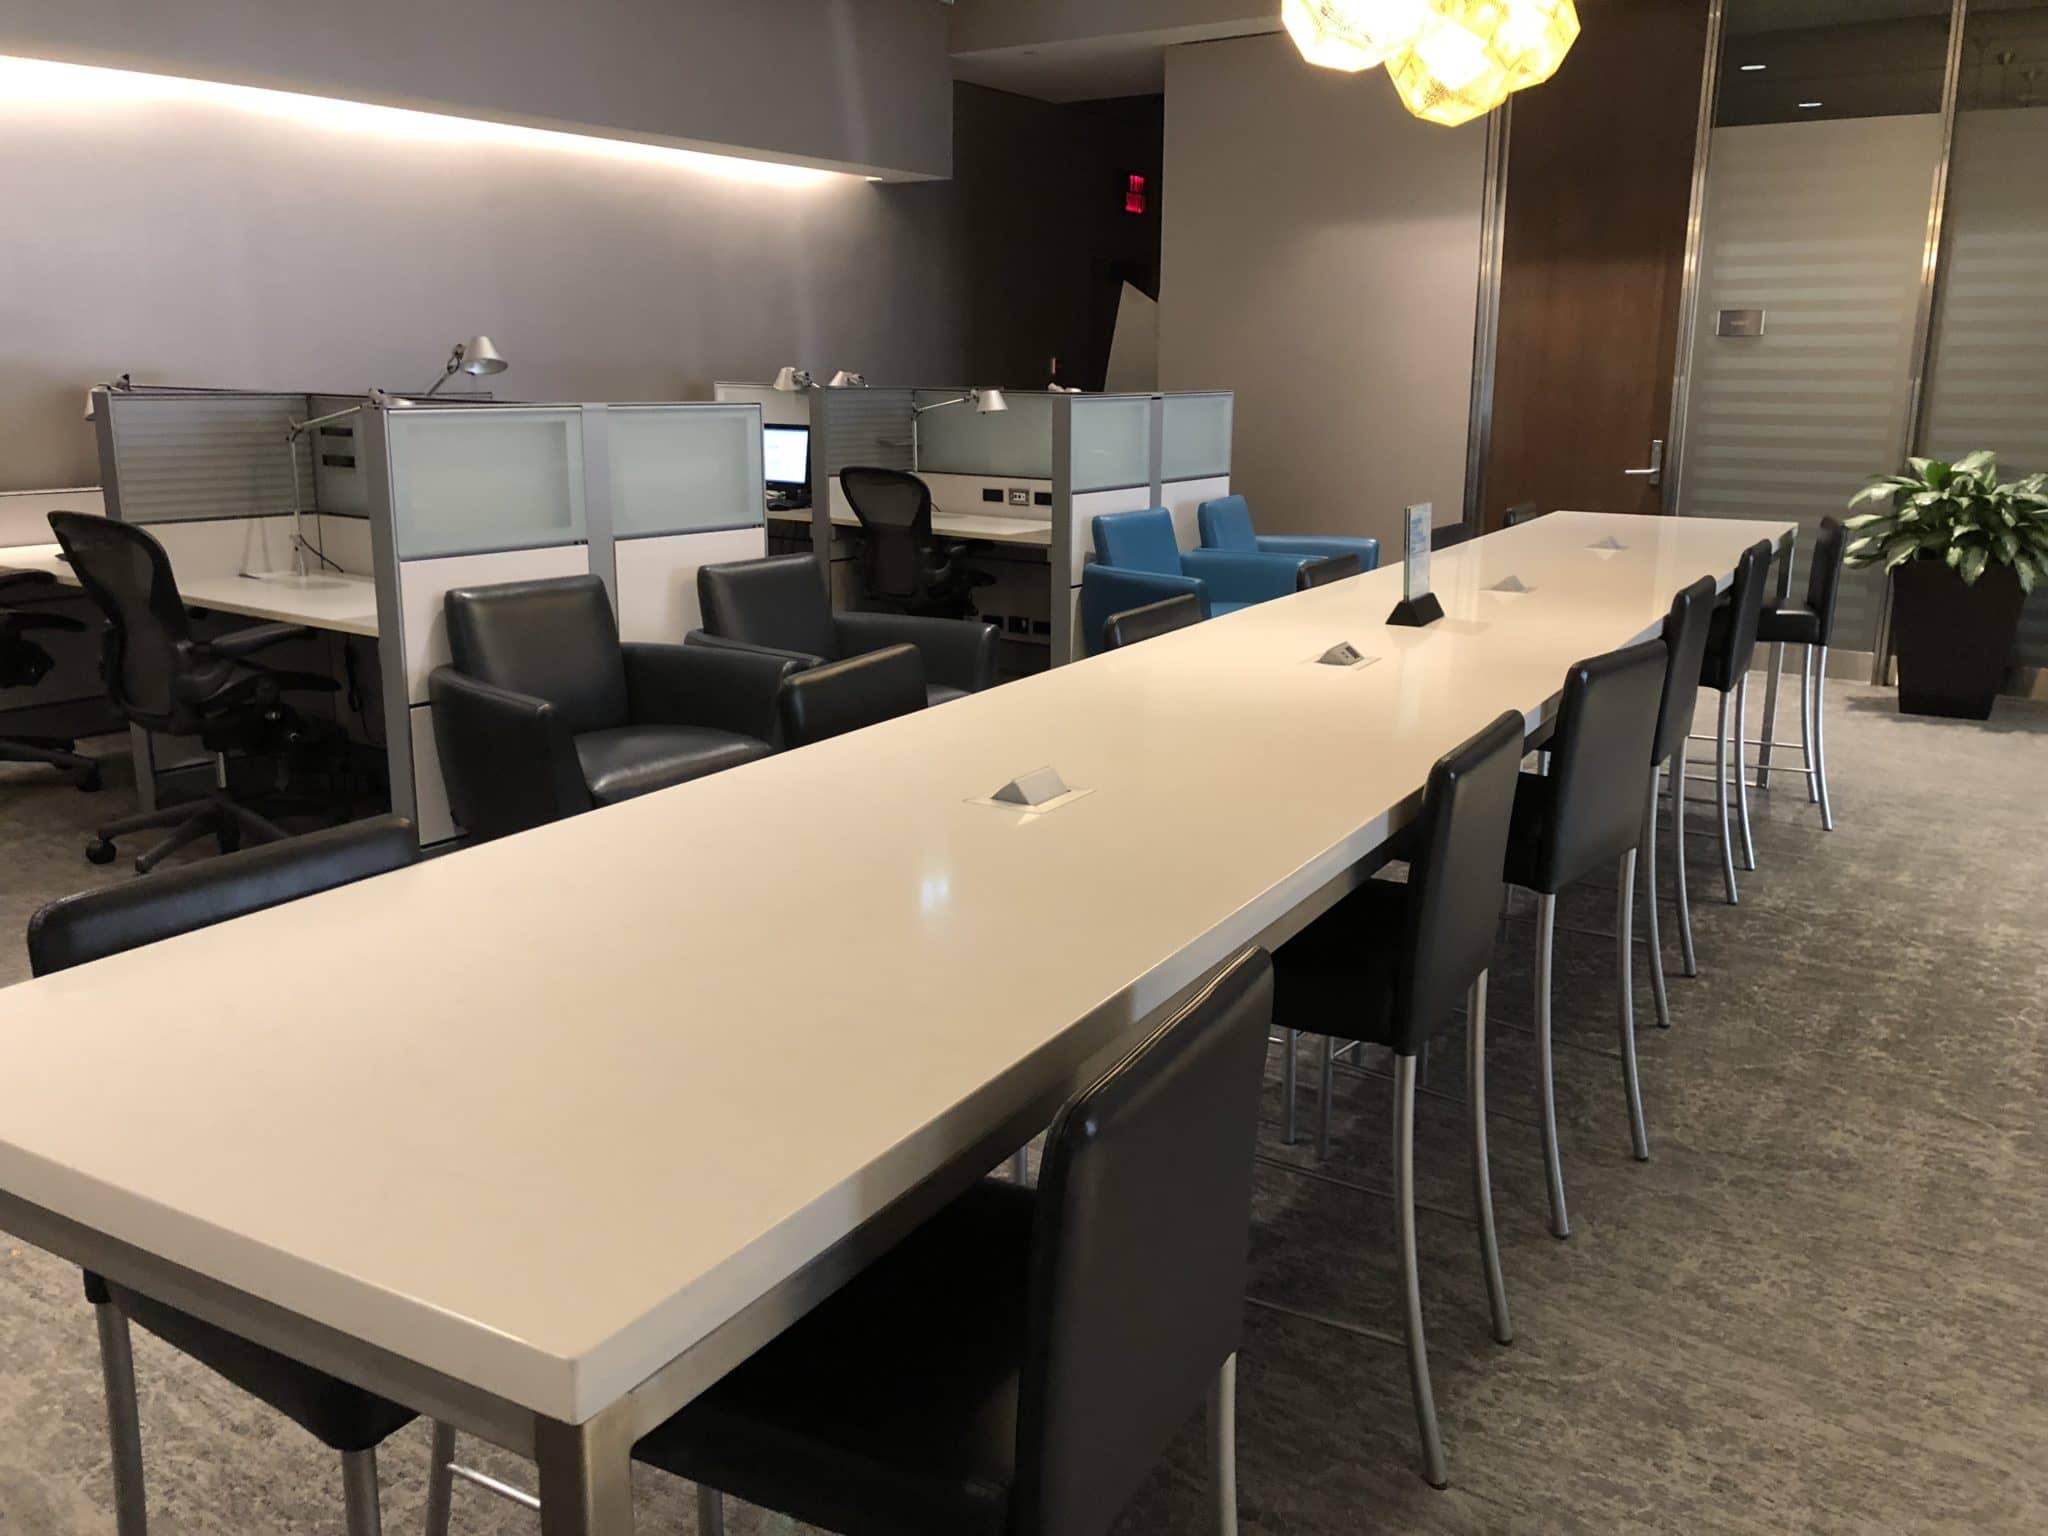 Air Canada Maple Leaf Lounge Calgary großer Tisch